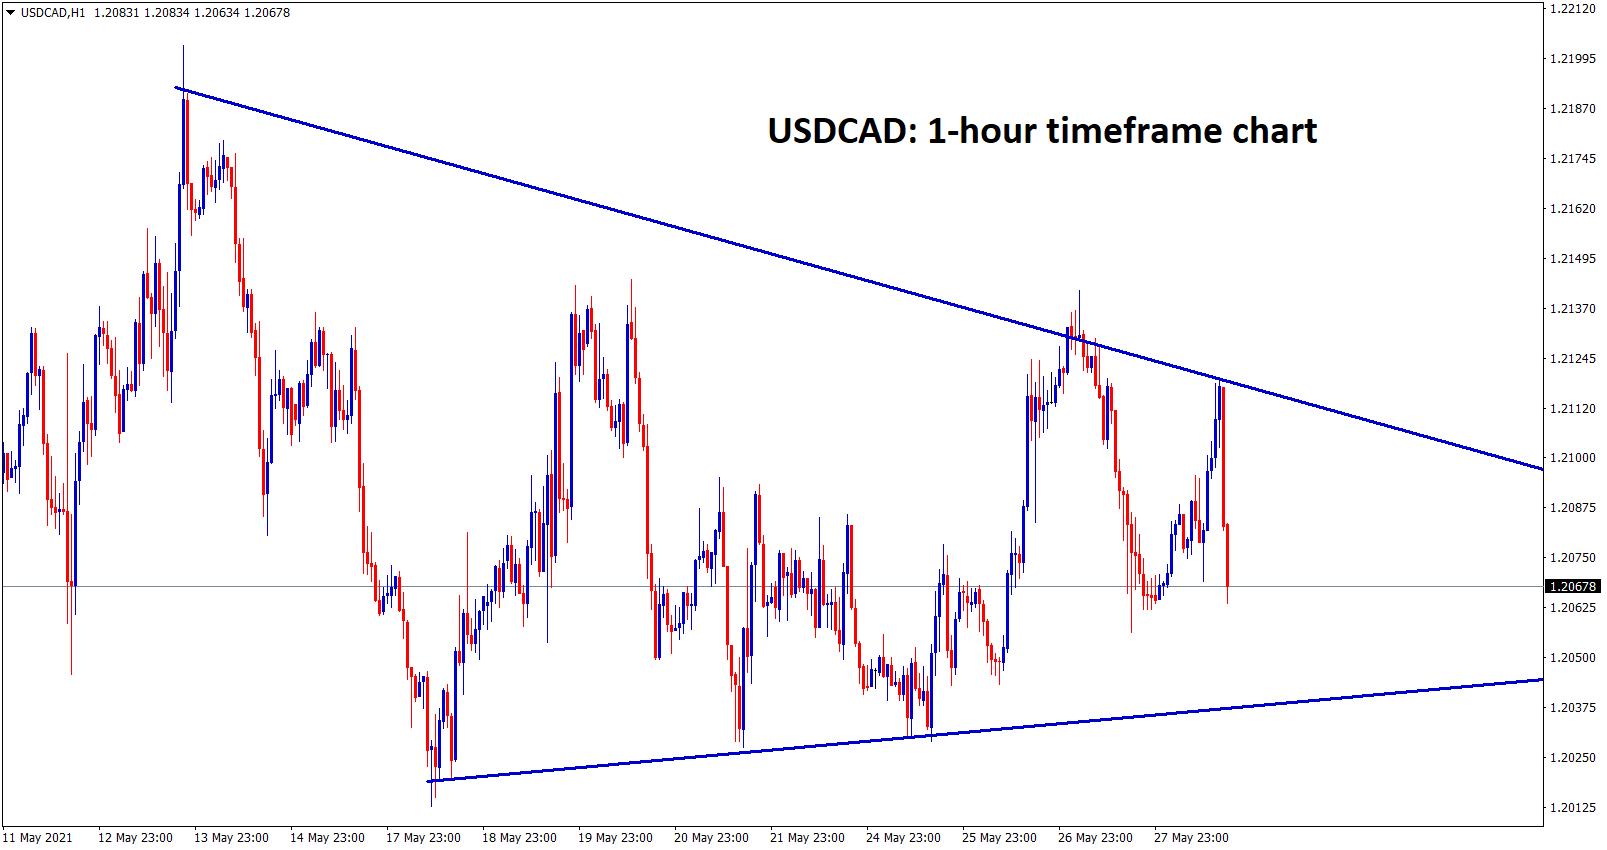 USDCAD moving in a symmetrical pattern range wait for breakout